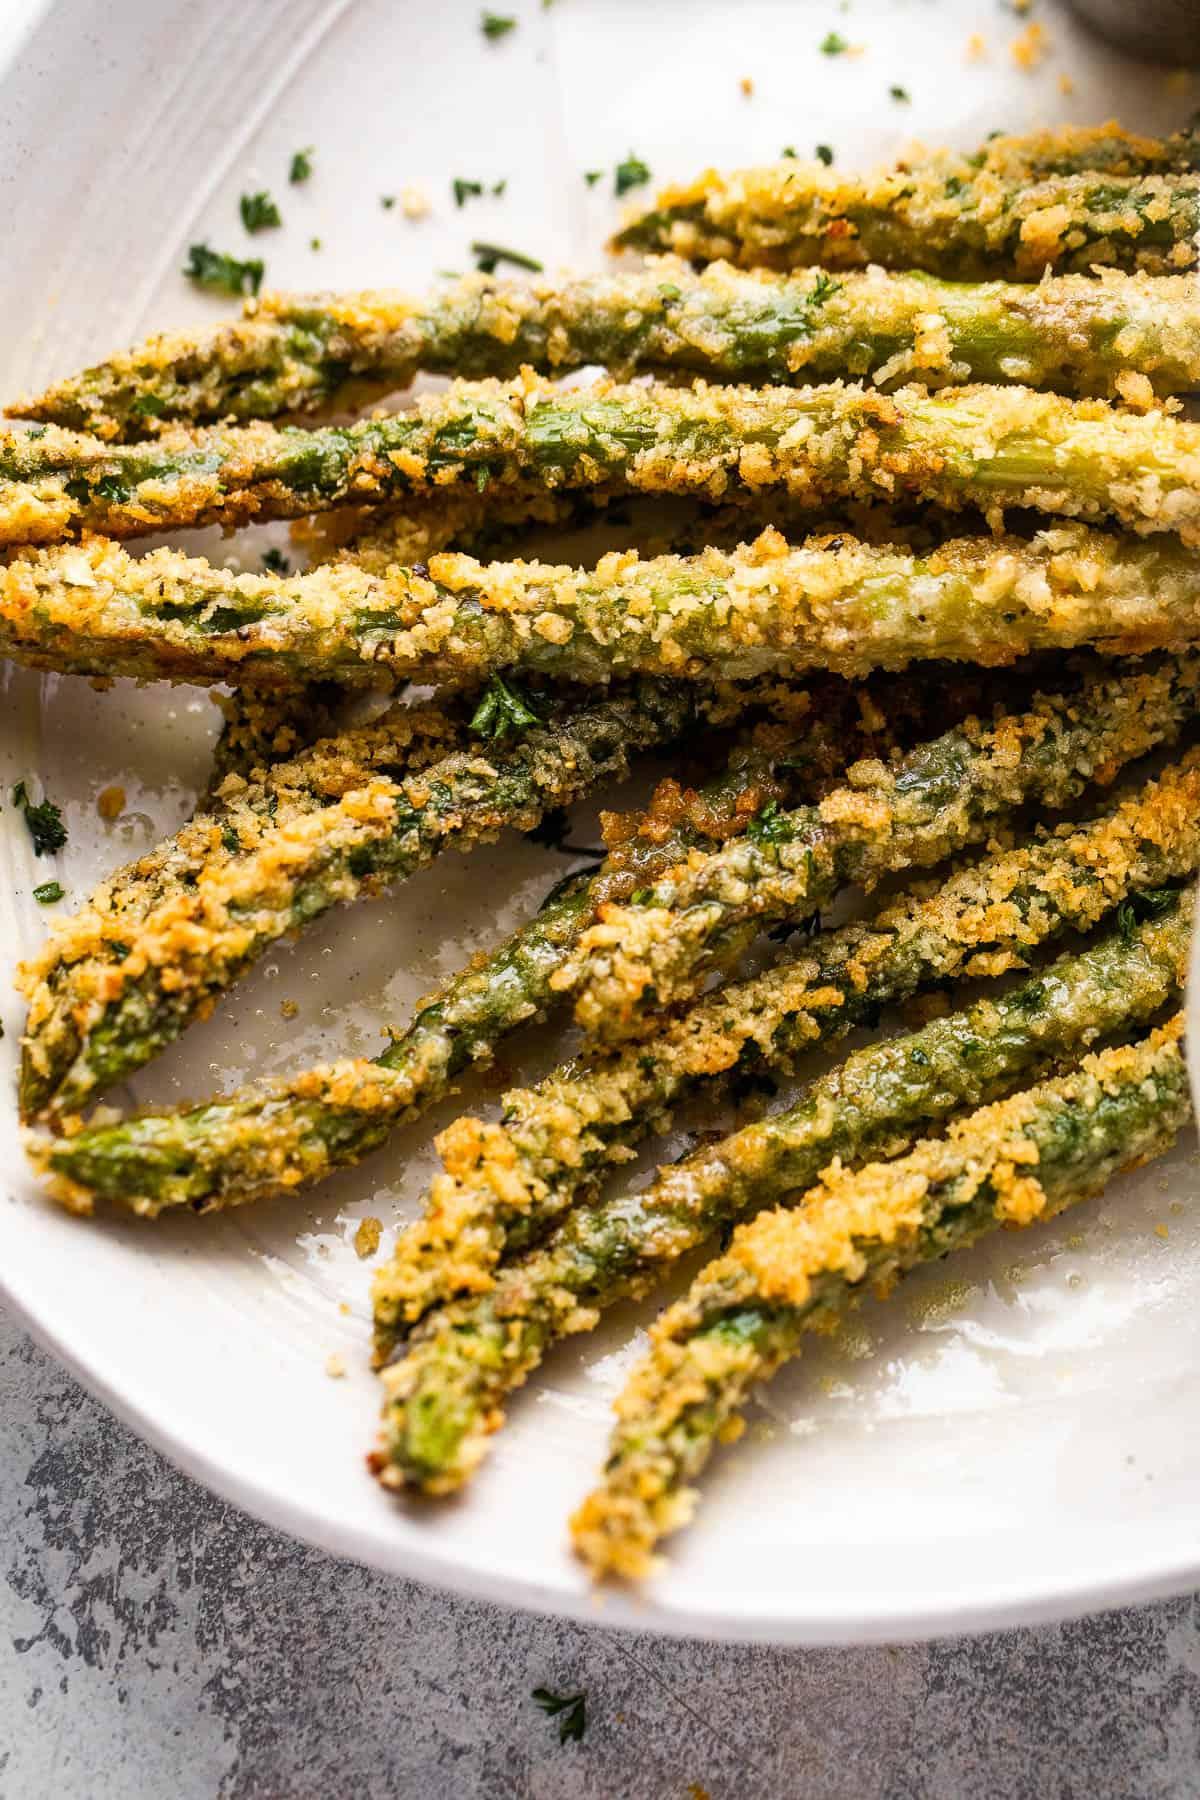 baked parmesan panko asparagus spears